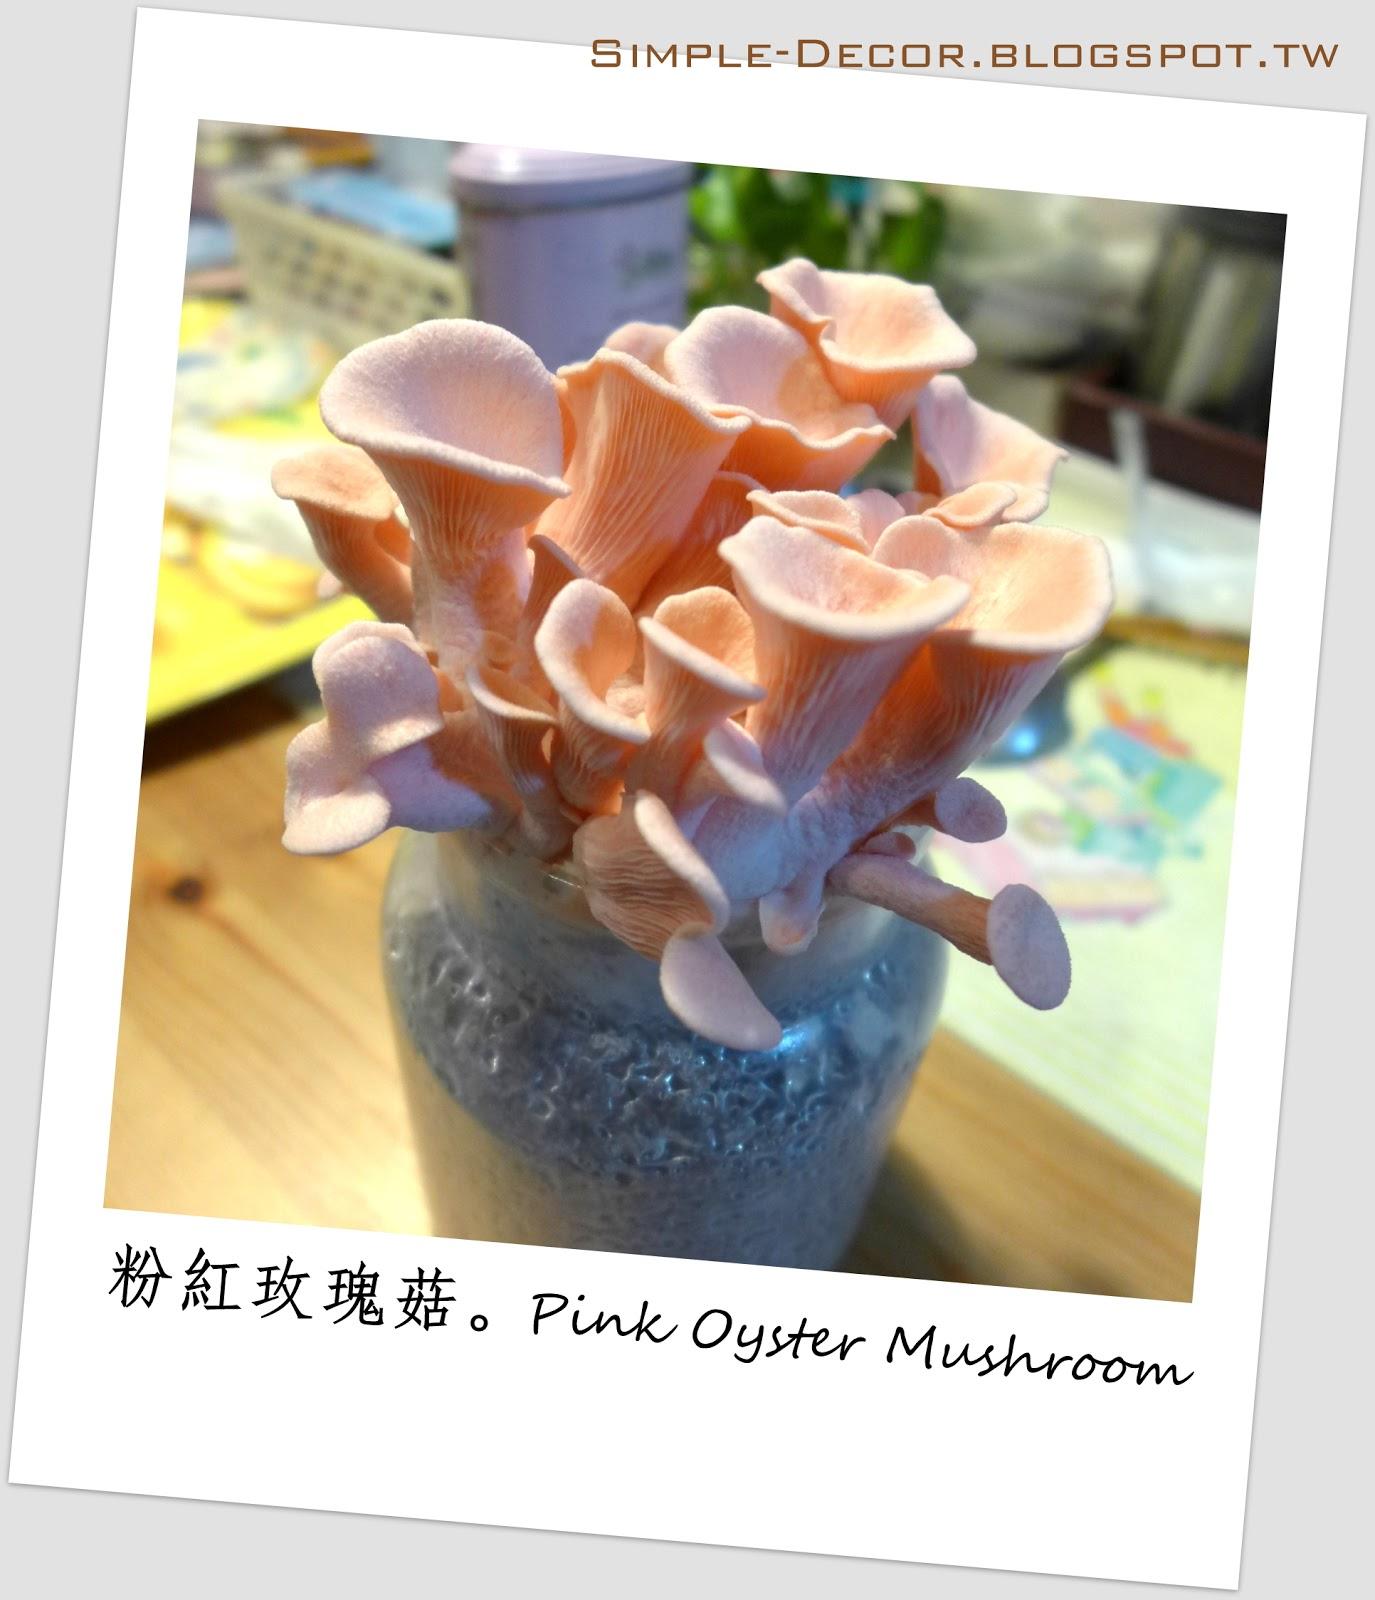 https://simple-decor.blogspot.com/2020/03/Pink-Oyster-Mushroom-DIY-growing-kit.html